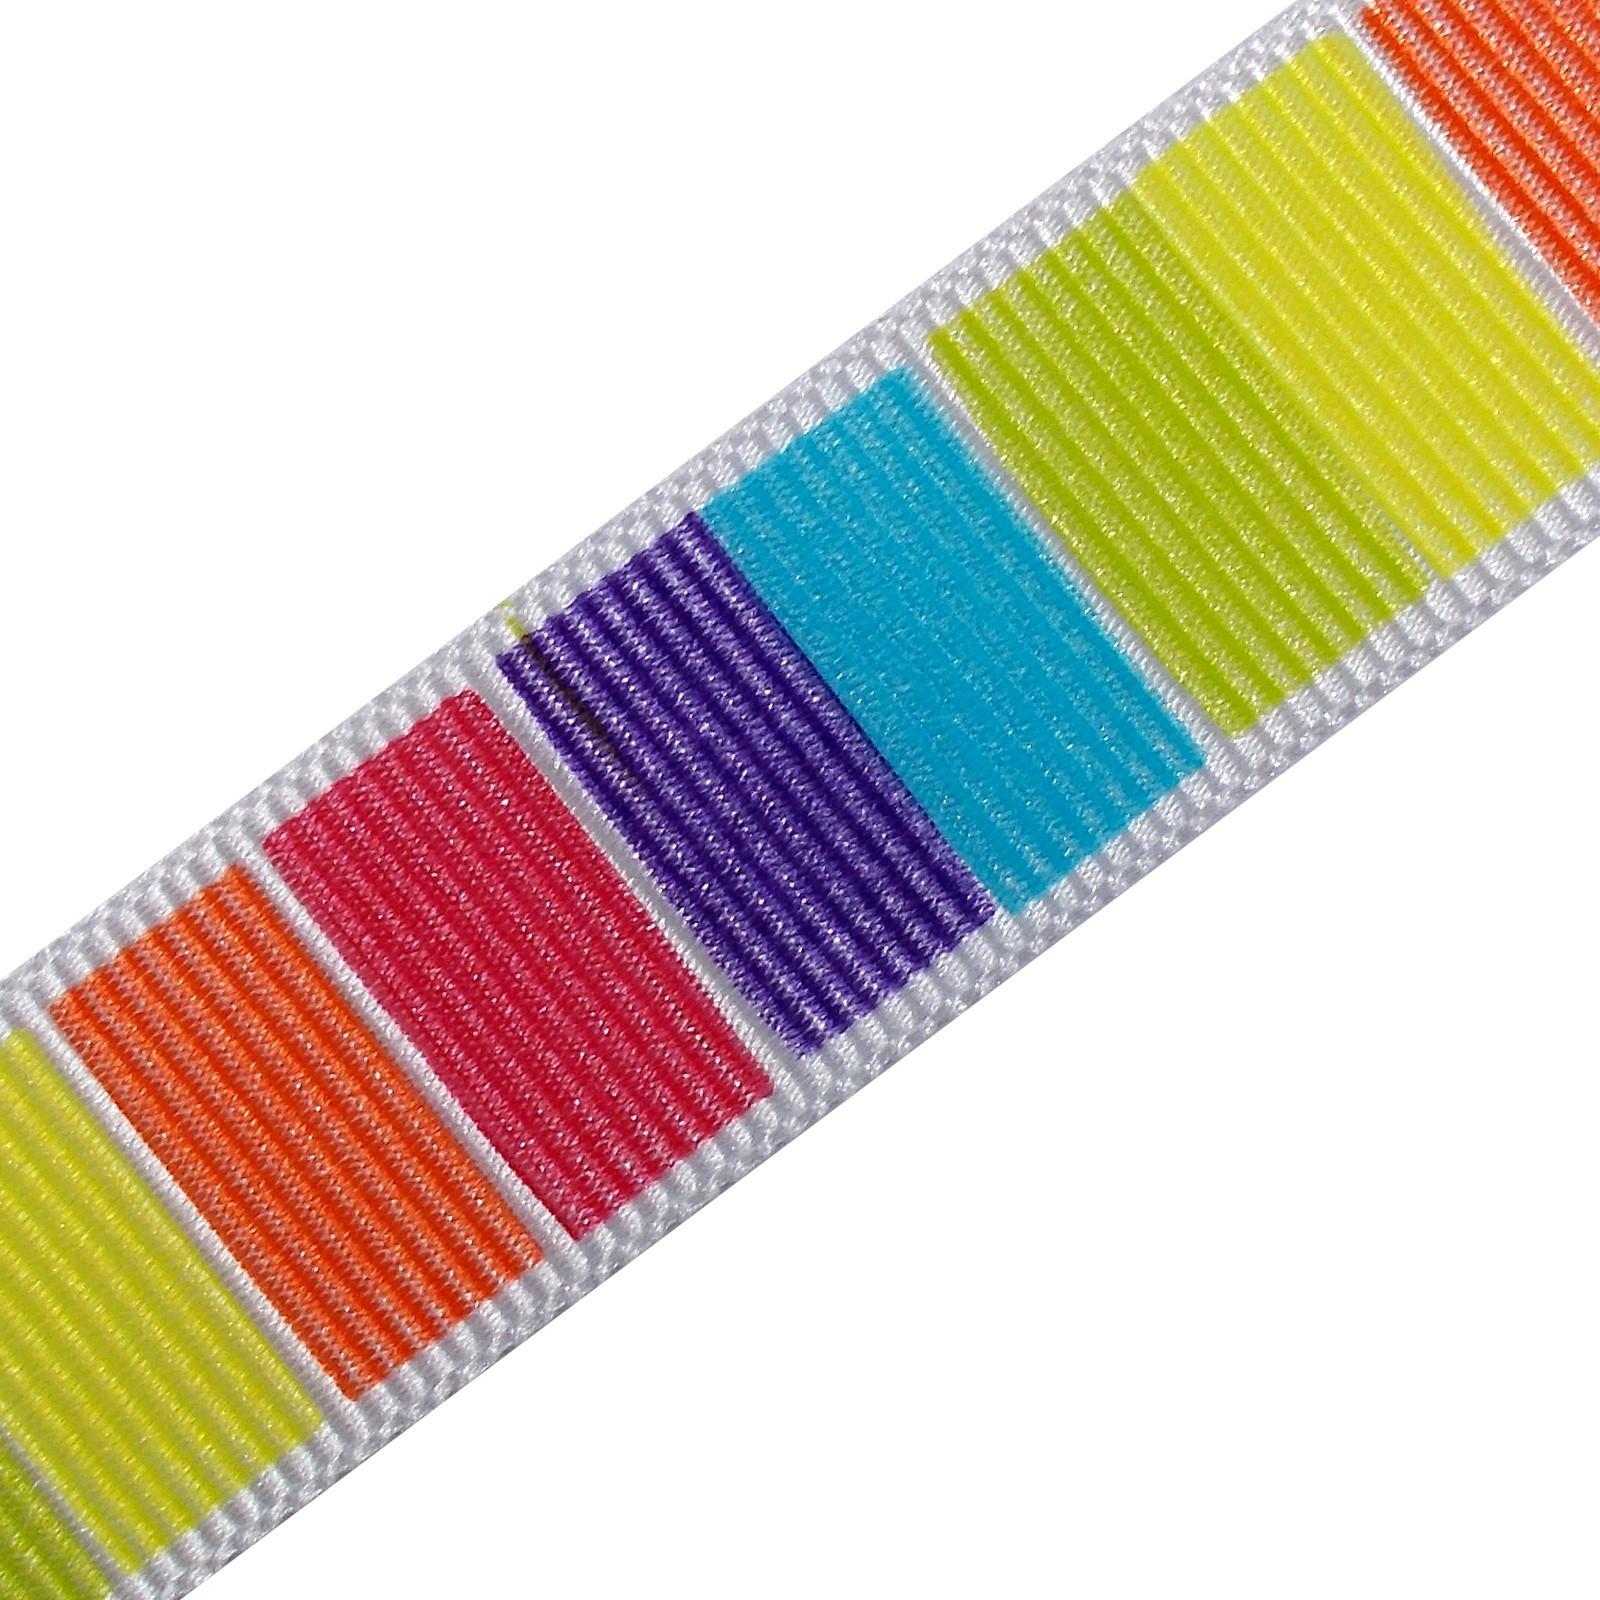 Berisfords Bright Rainbow Grosgrain Ribbon 25mm wide Block Stripes 2 metre length